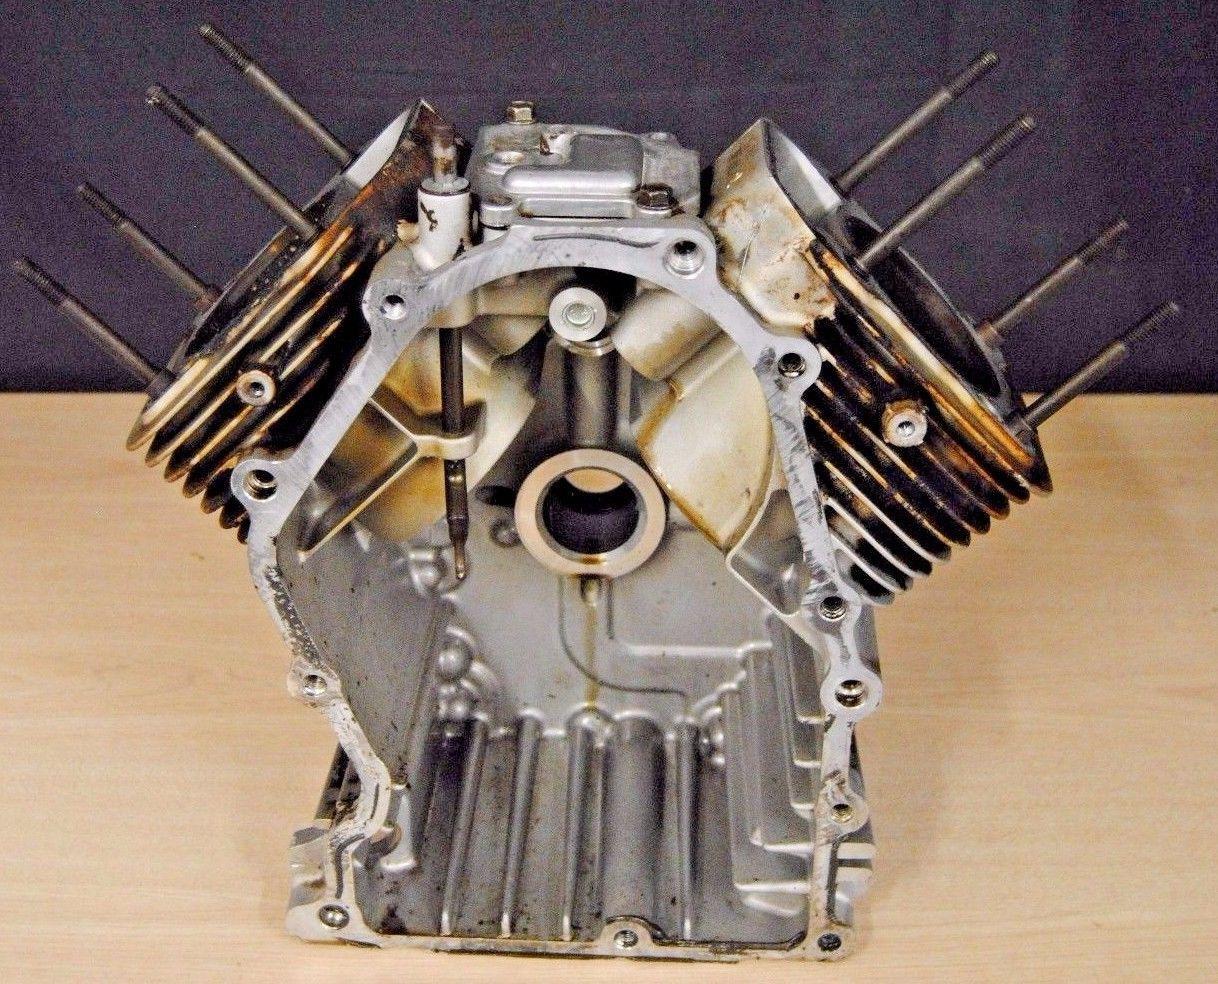 Kohler Engines cv18 Crankcase (aen88h)